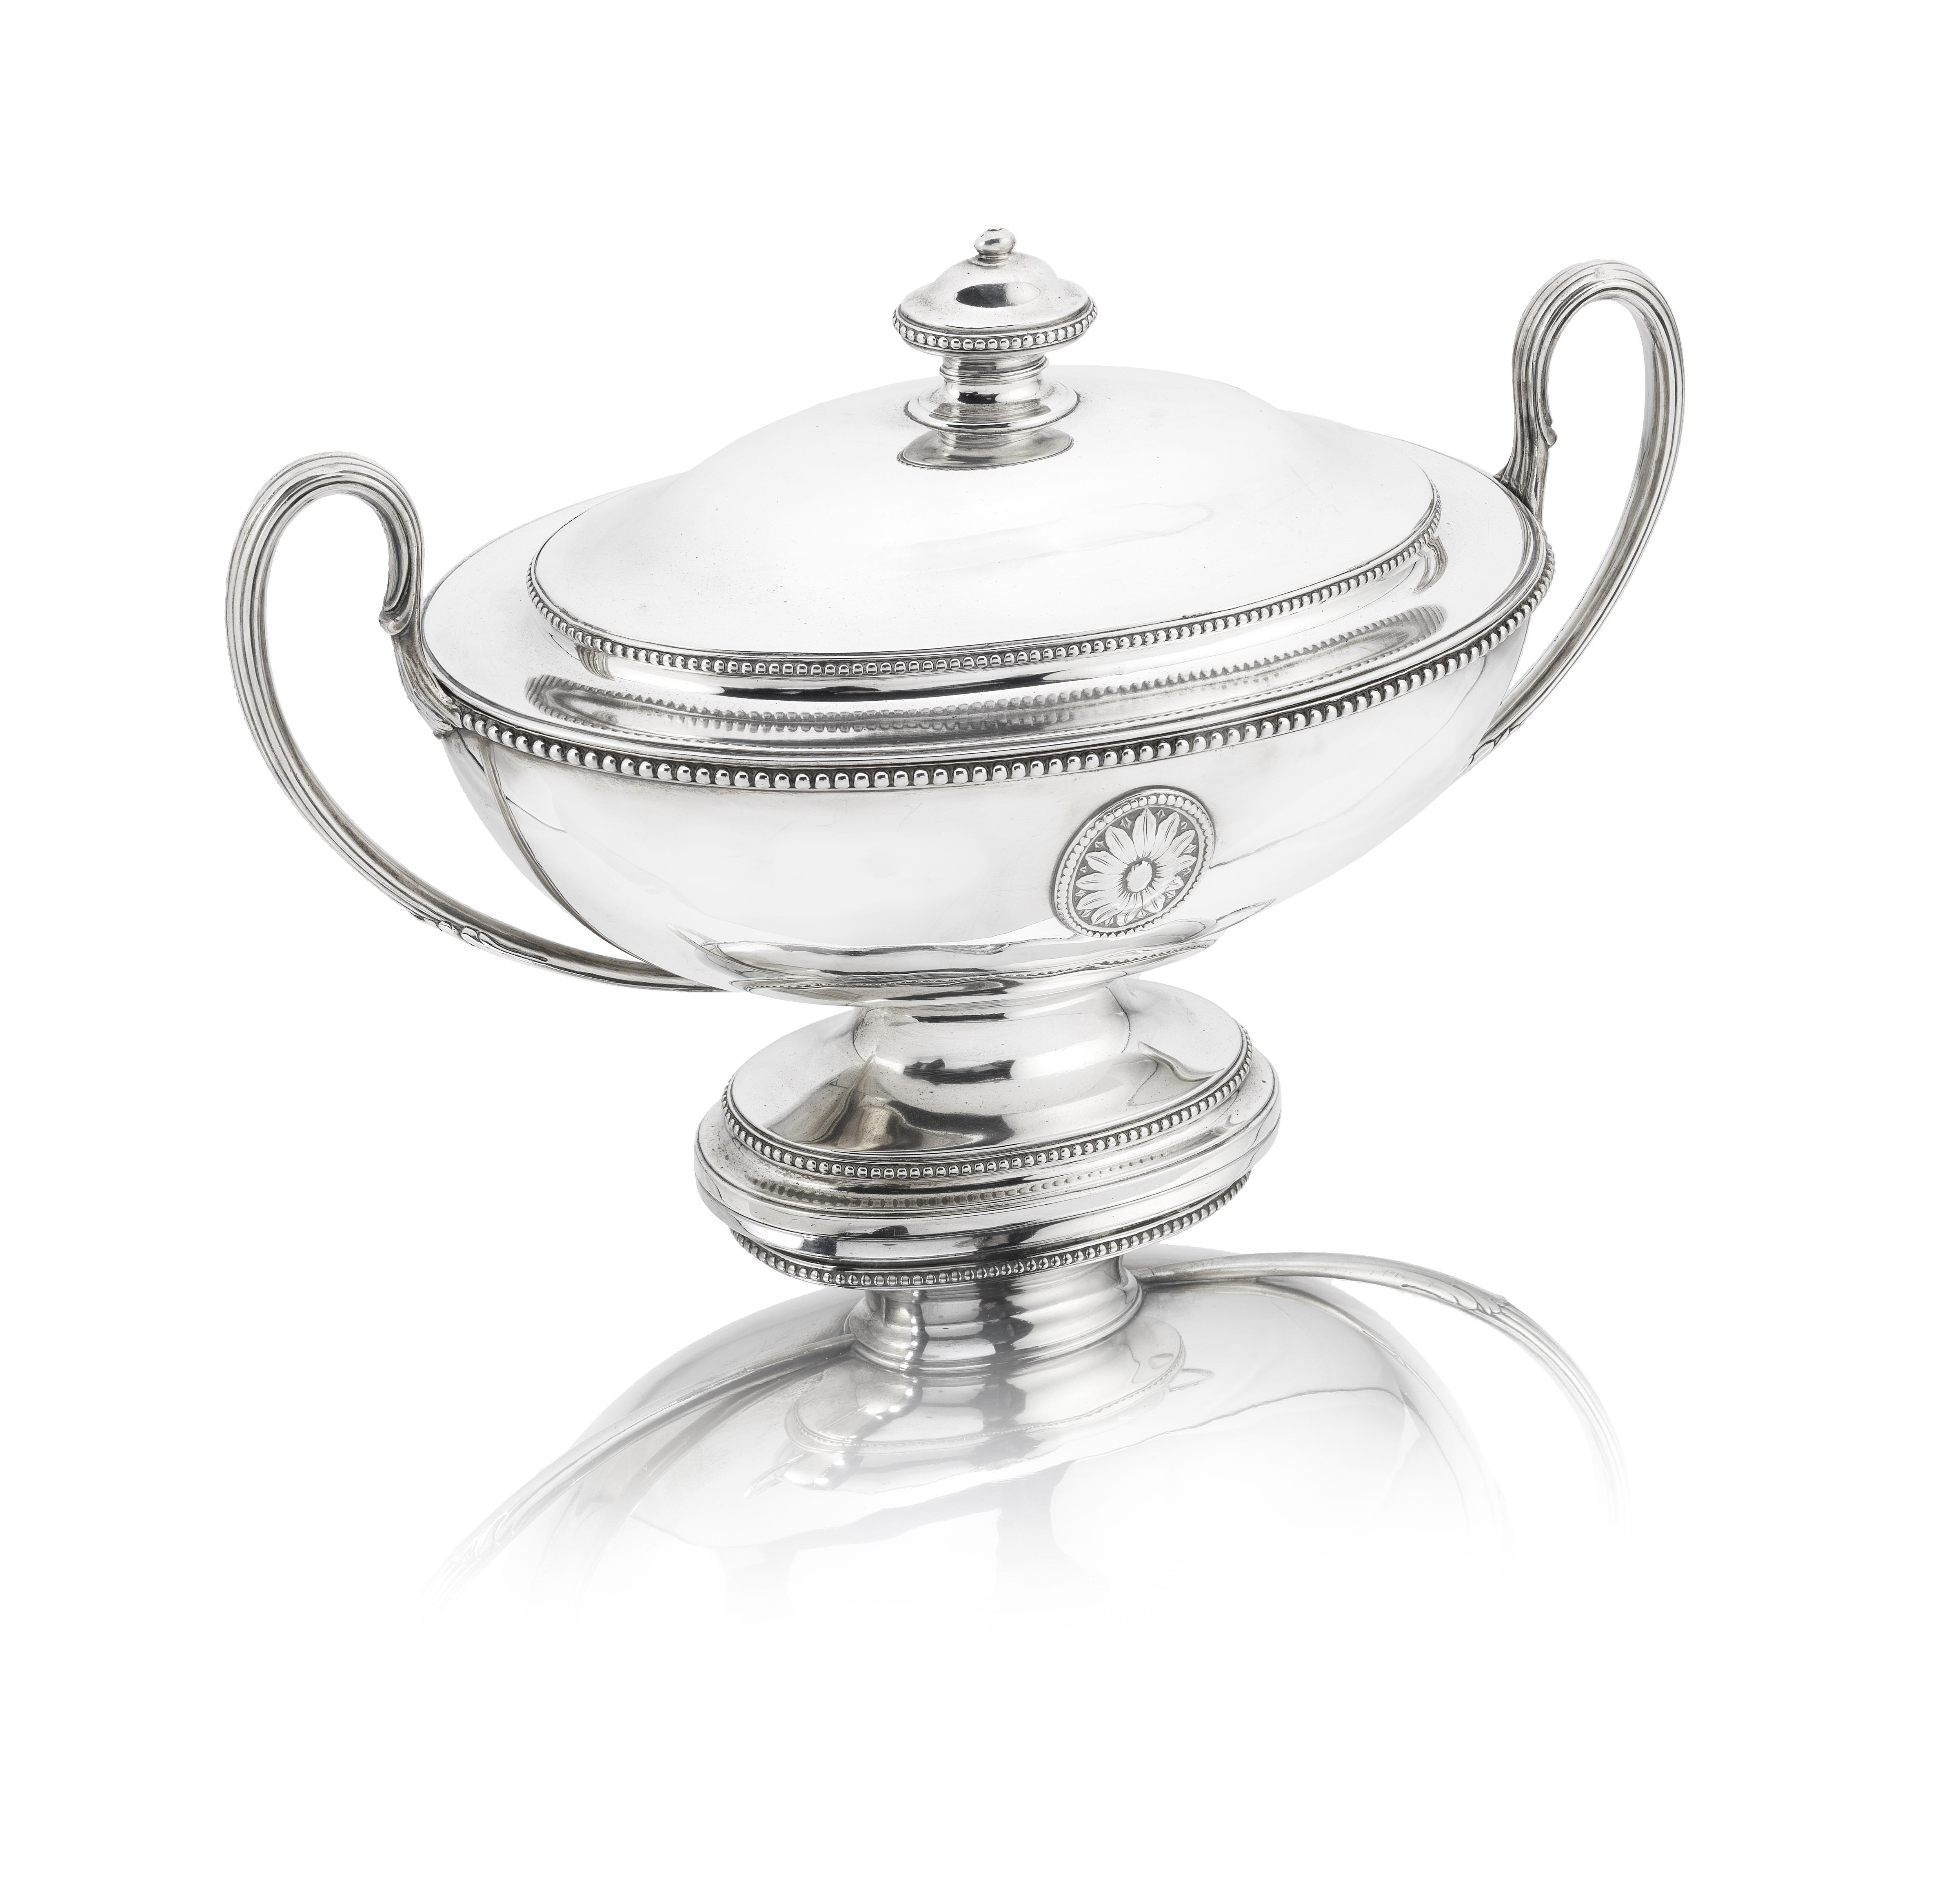 Lot 56 - A George III silver soup tureen Thomas Heming, London 1777